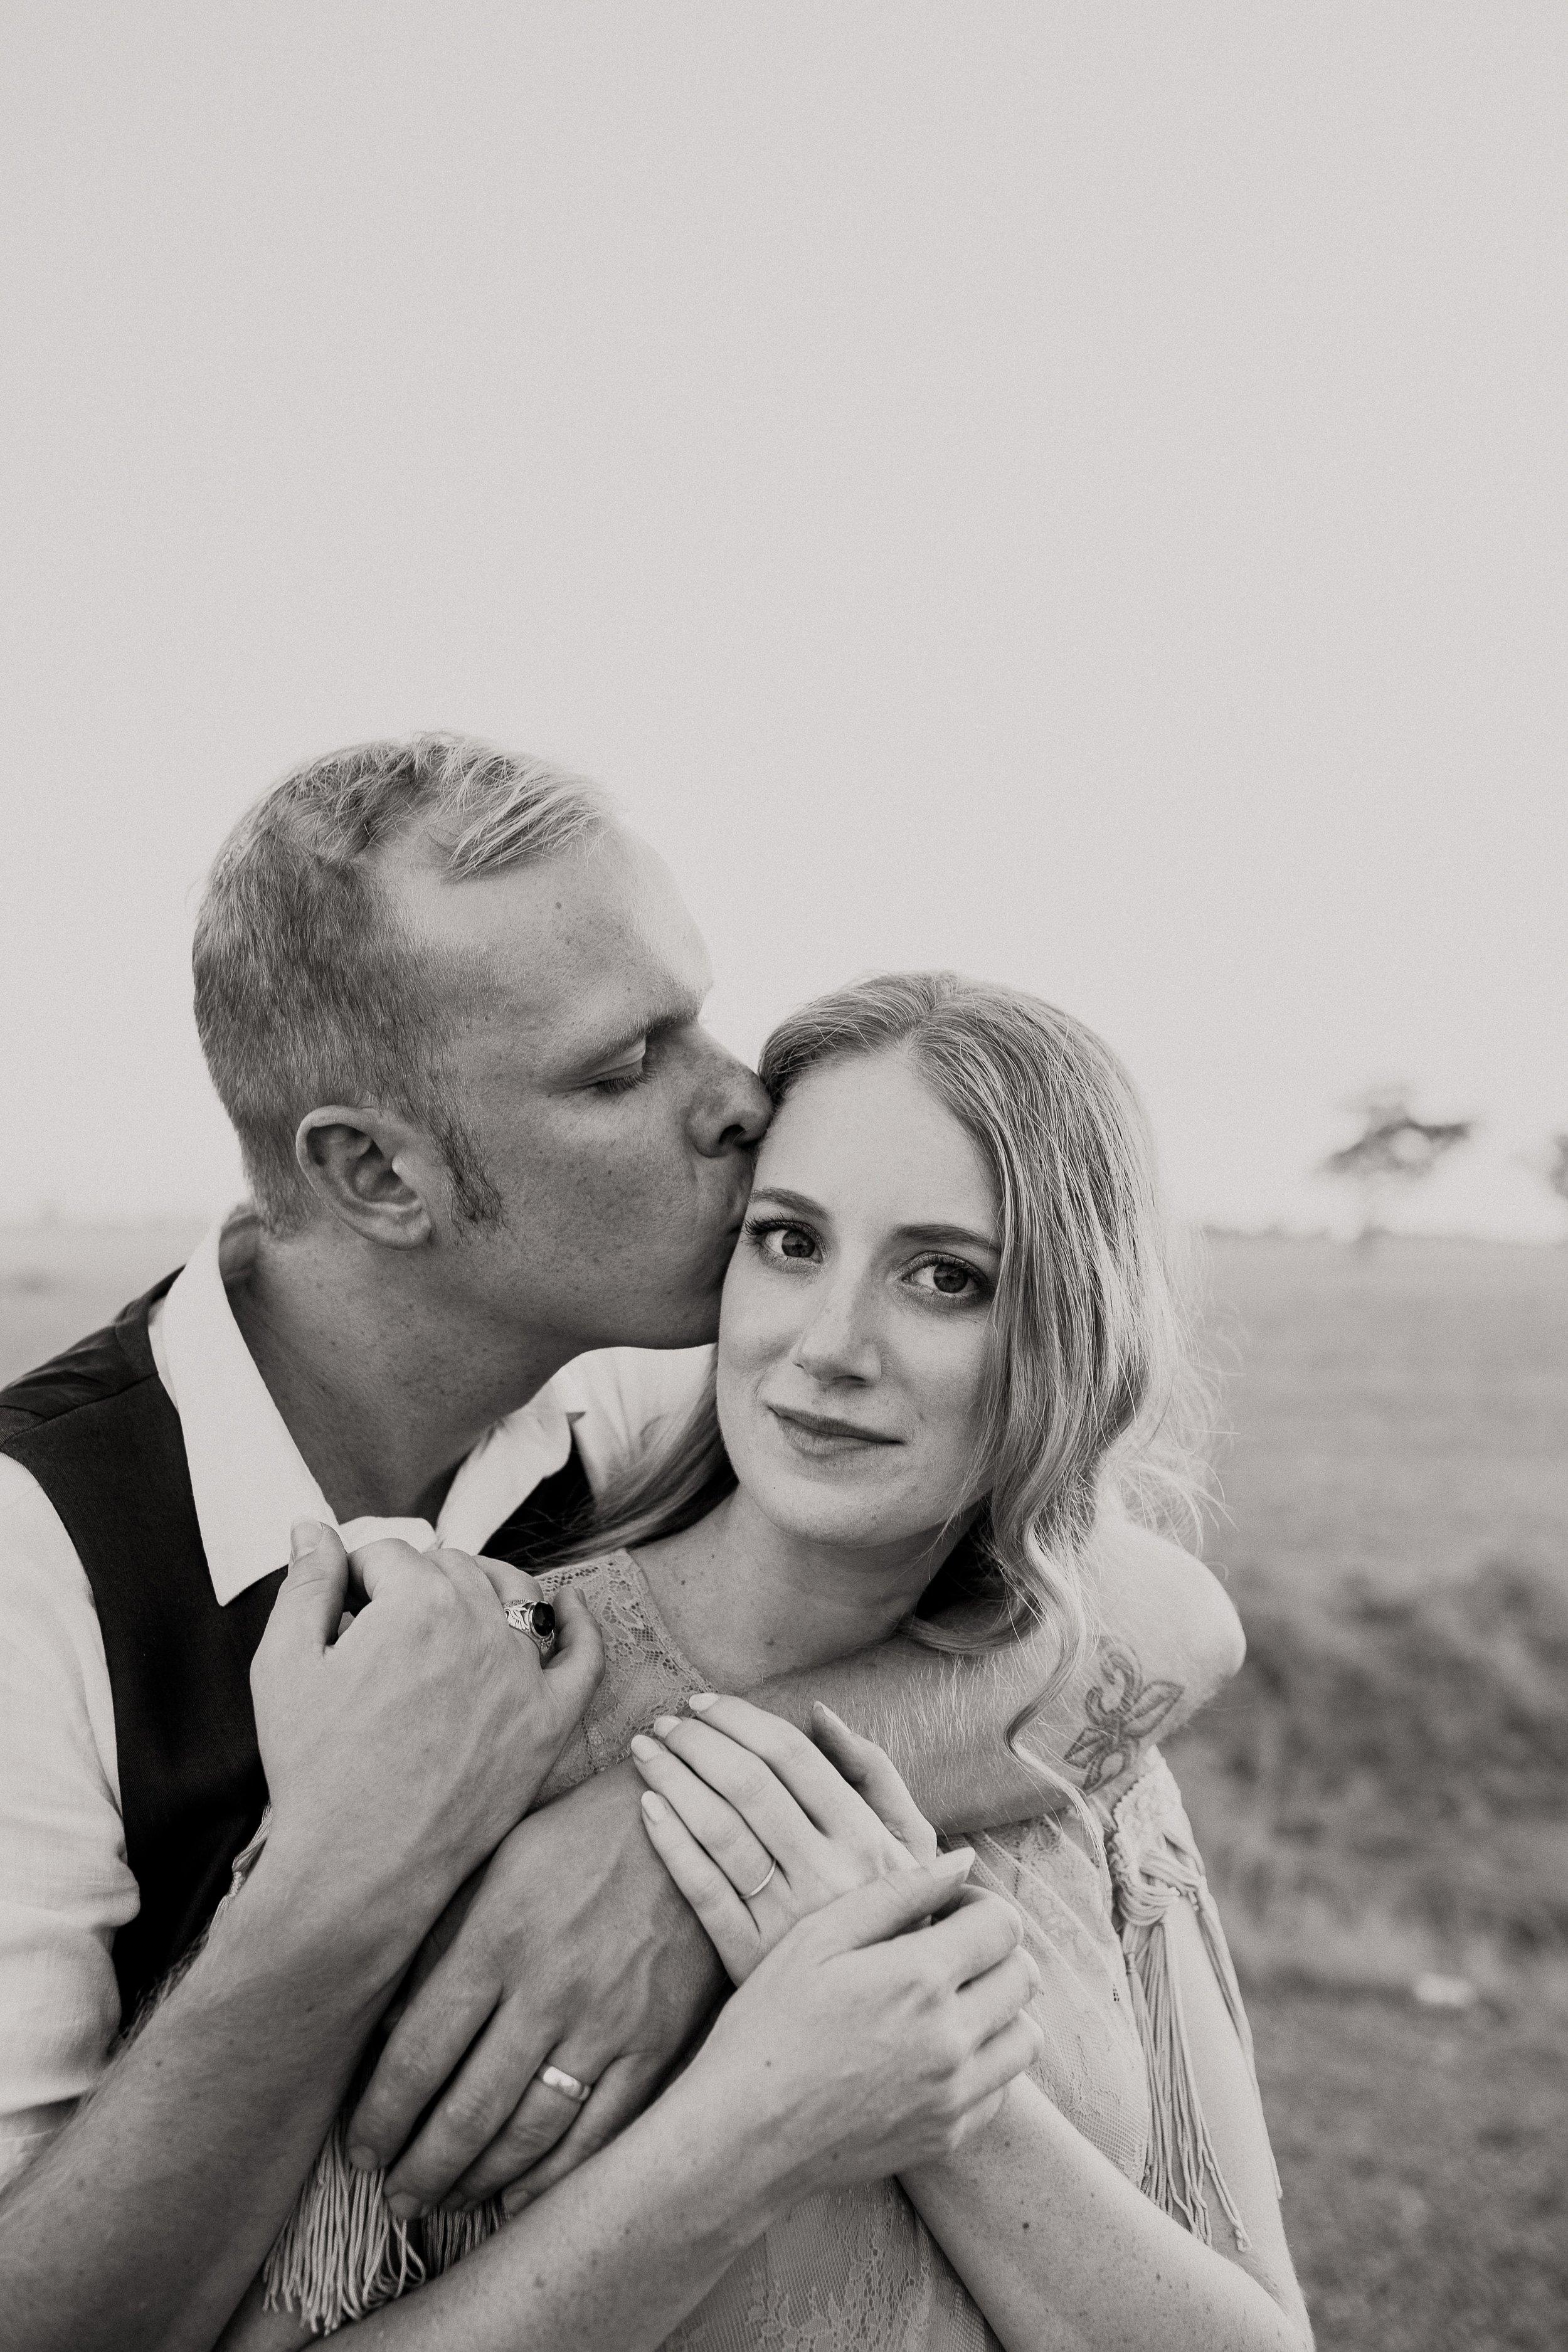 mickalathomas_puremacphotography_weddingphotographer_couplephotographer_Sheppartonphotographer_2153.jpg